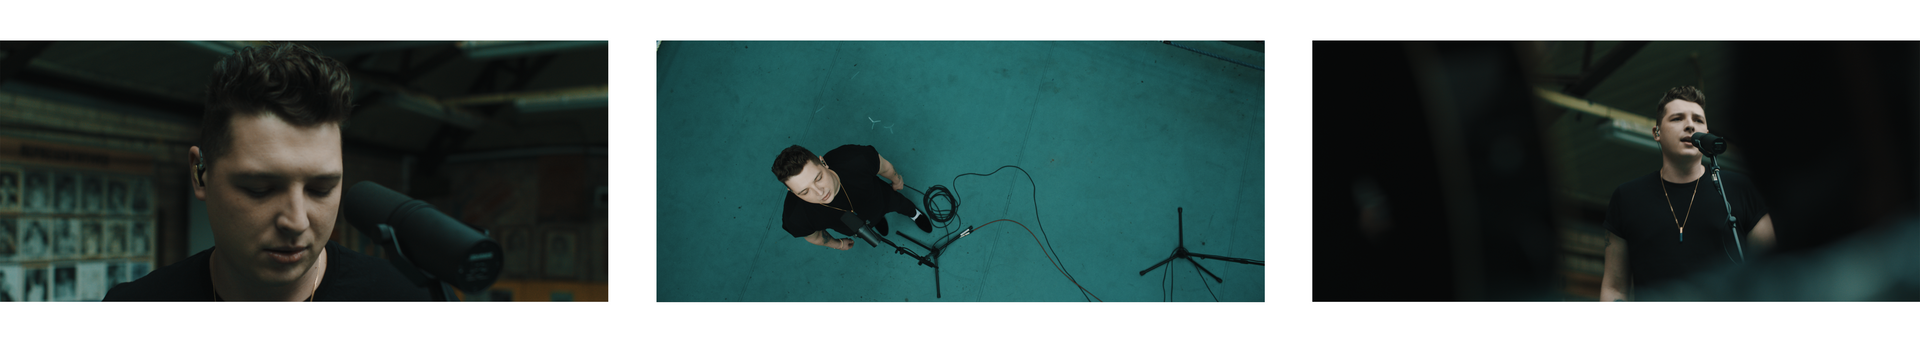 John Newman - Fire in Me (Acoustic)